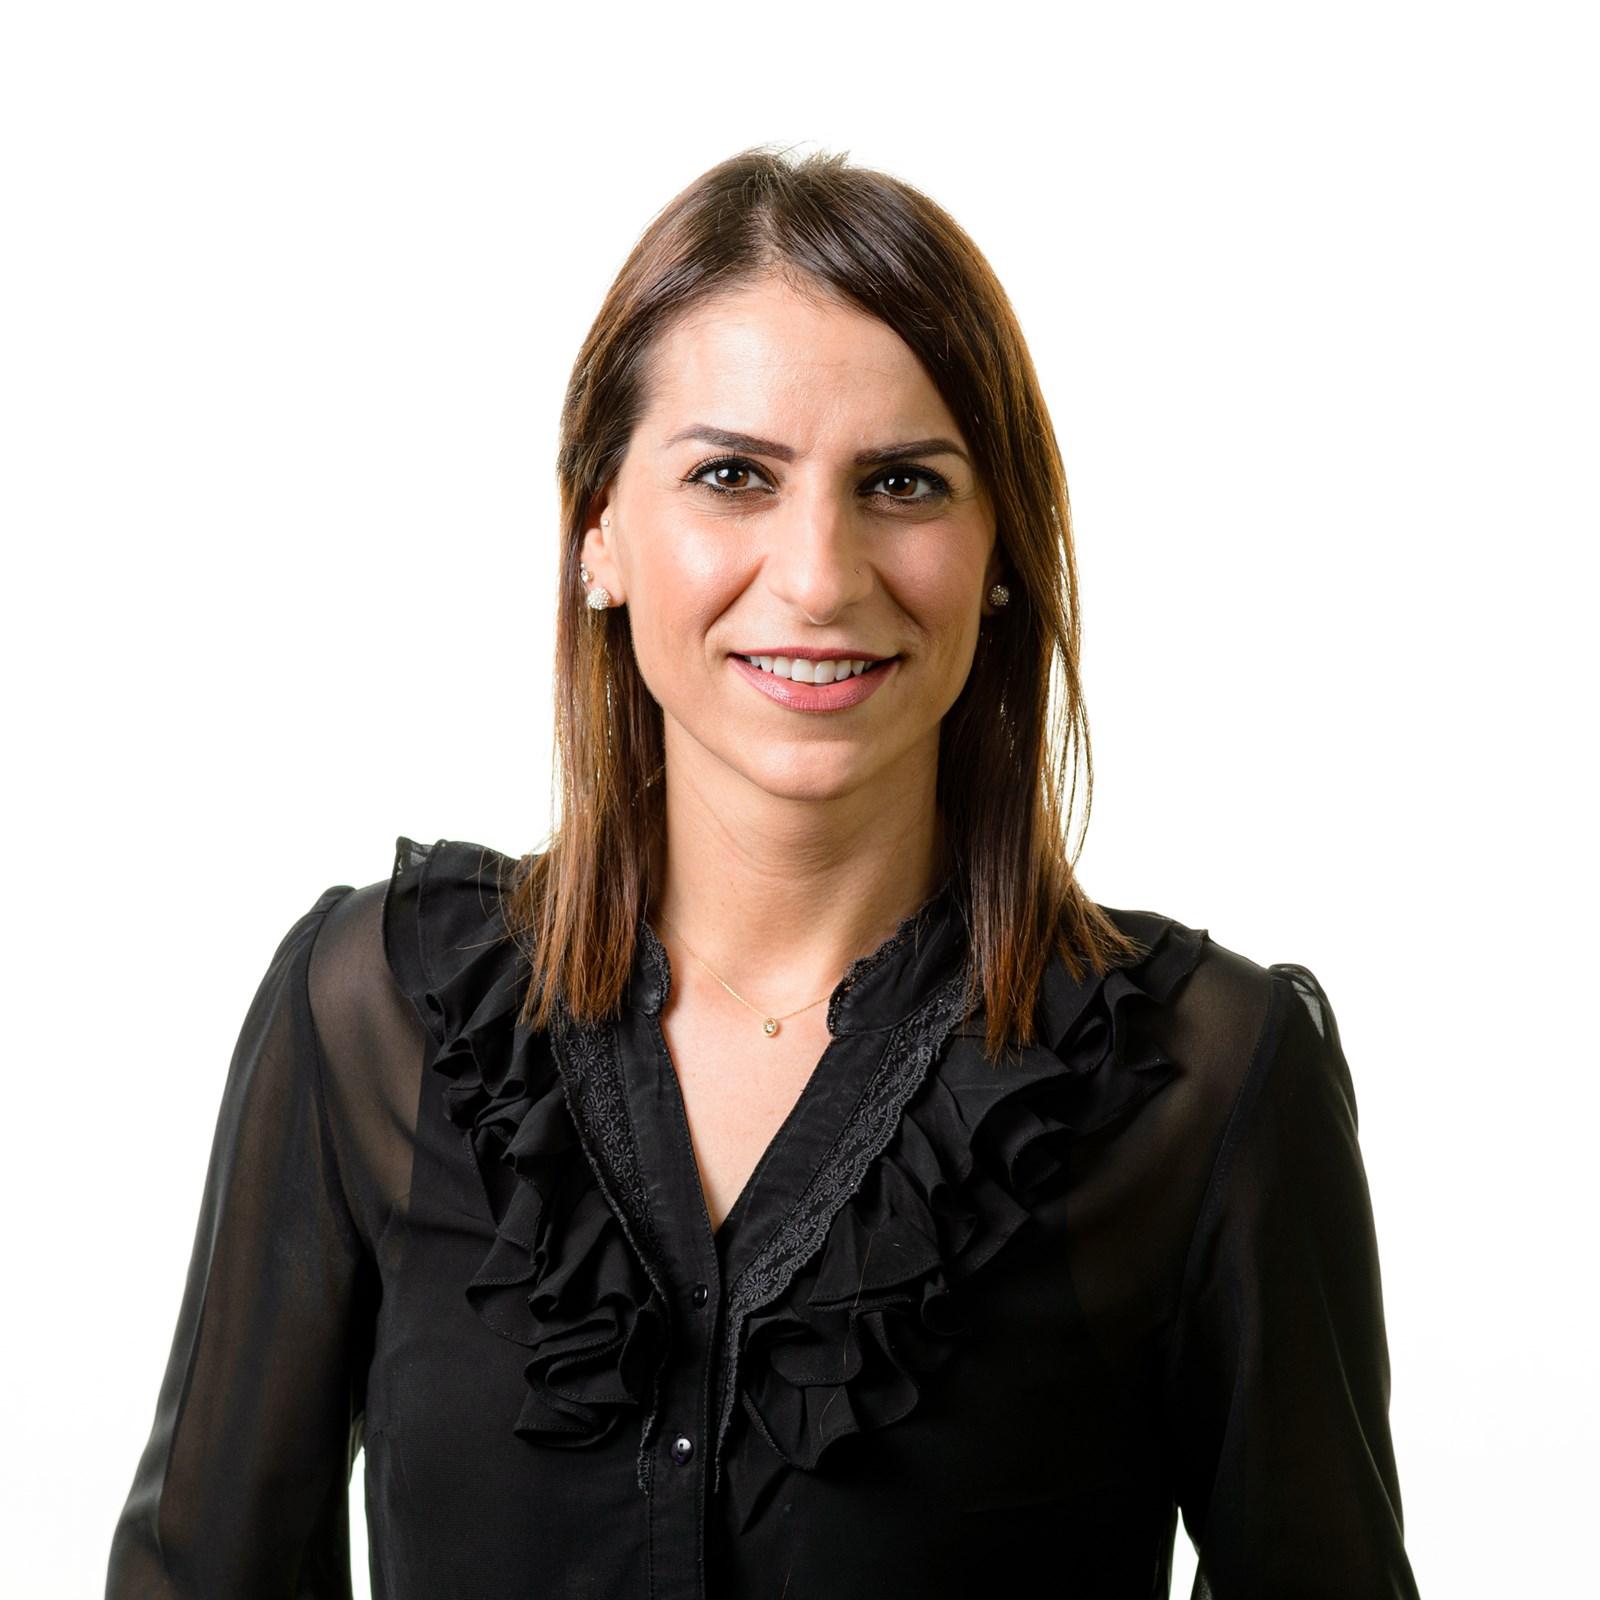 Foto van Betül  Özdemir